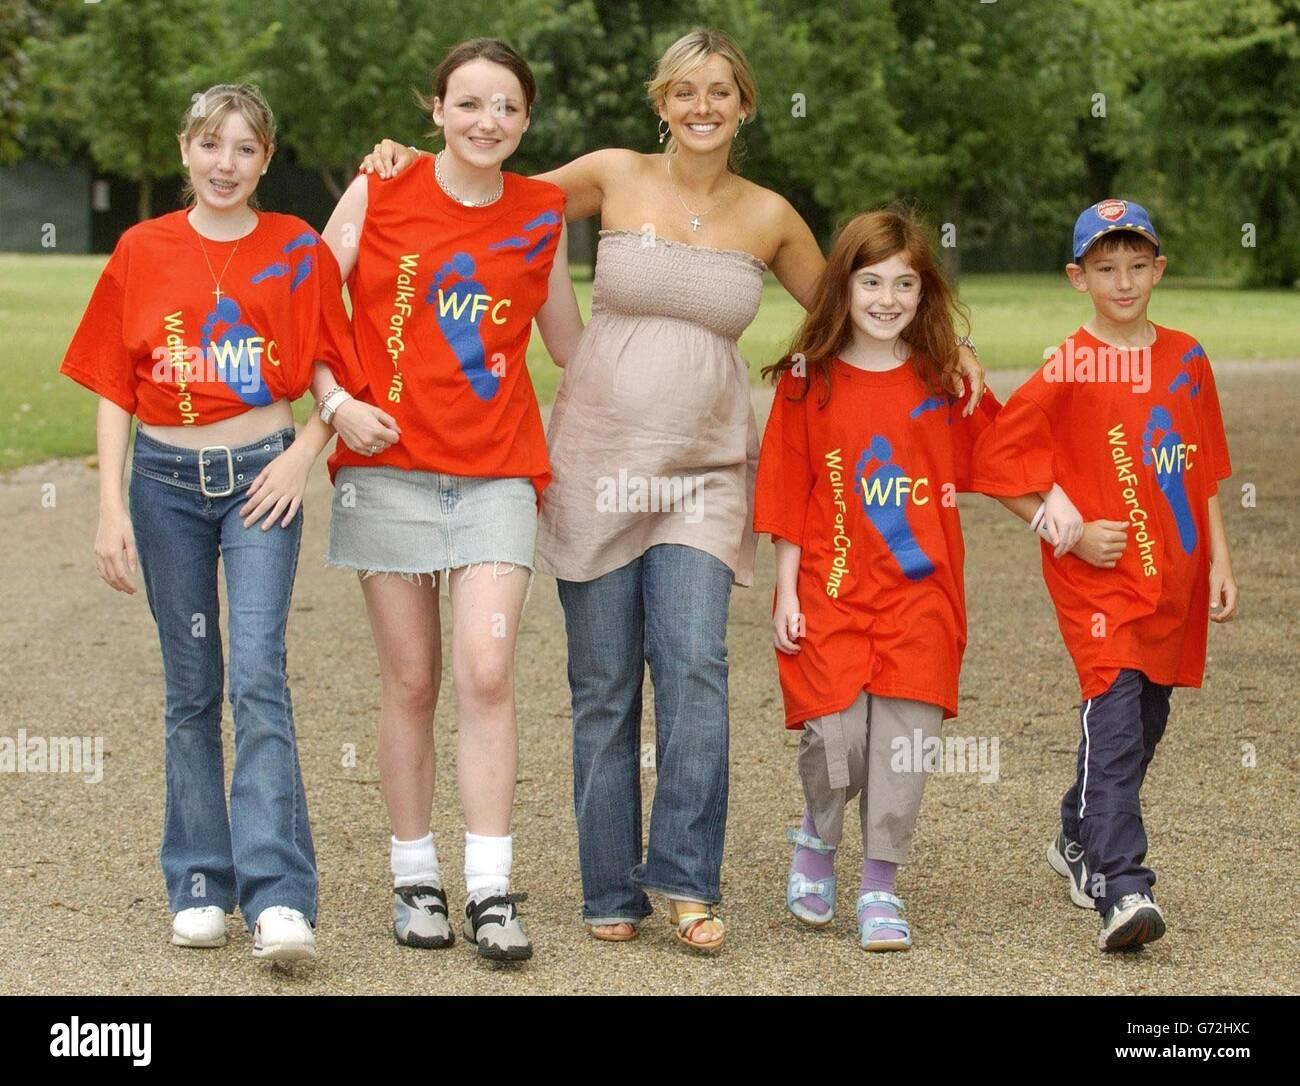 Louise Redknapp Pregnant - Stock Image